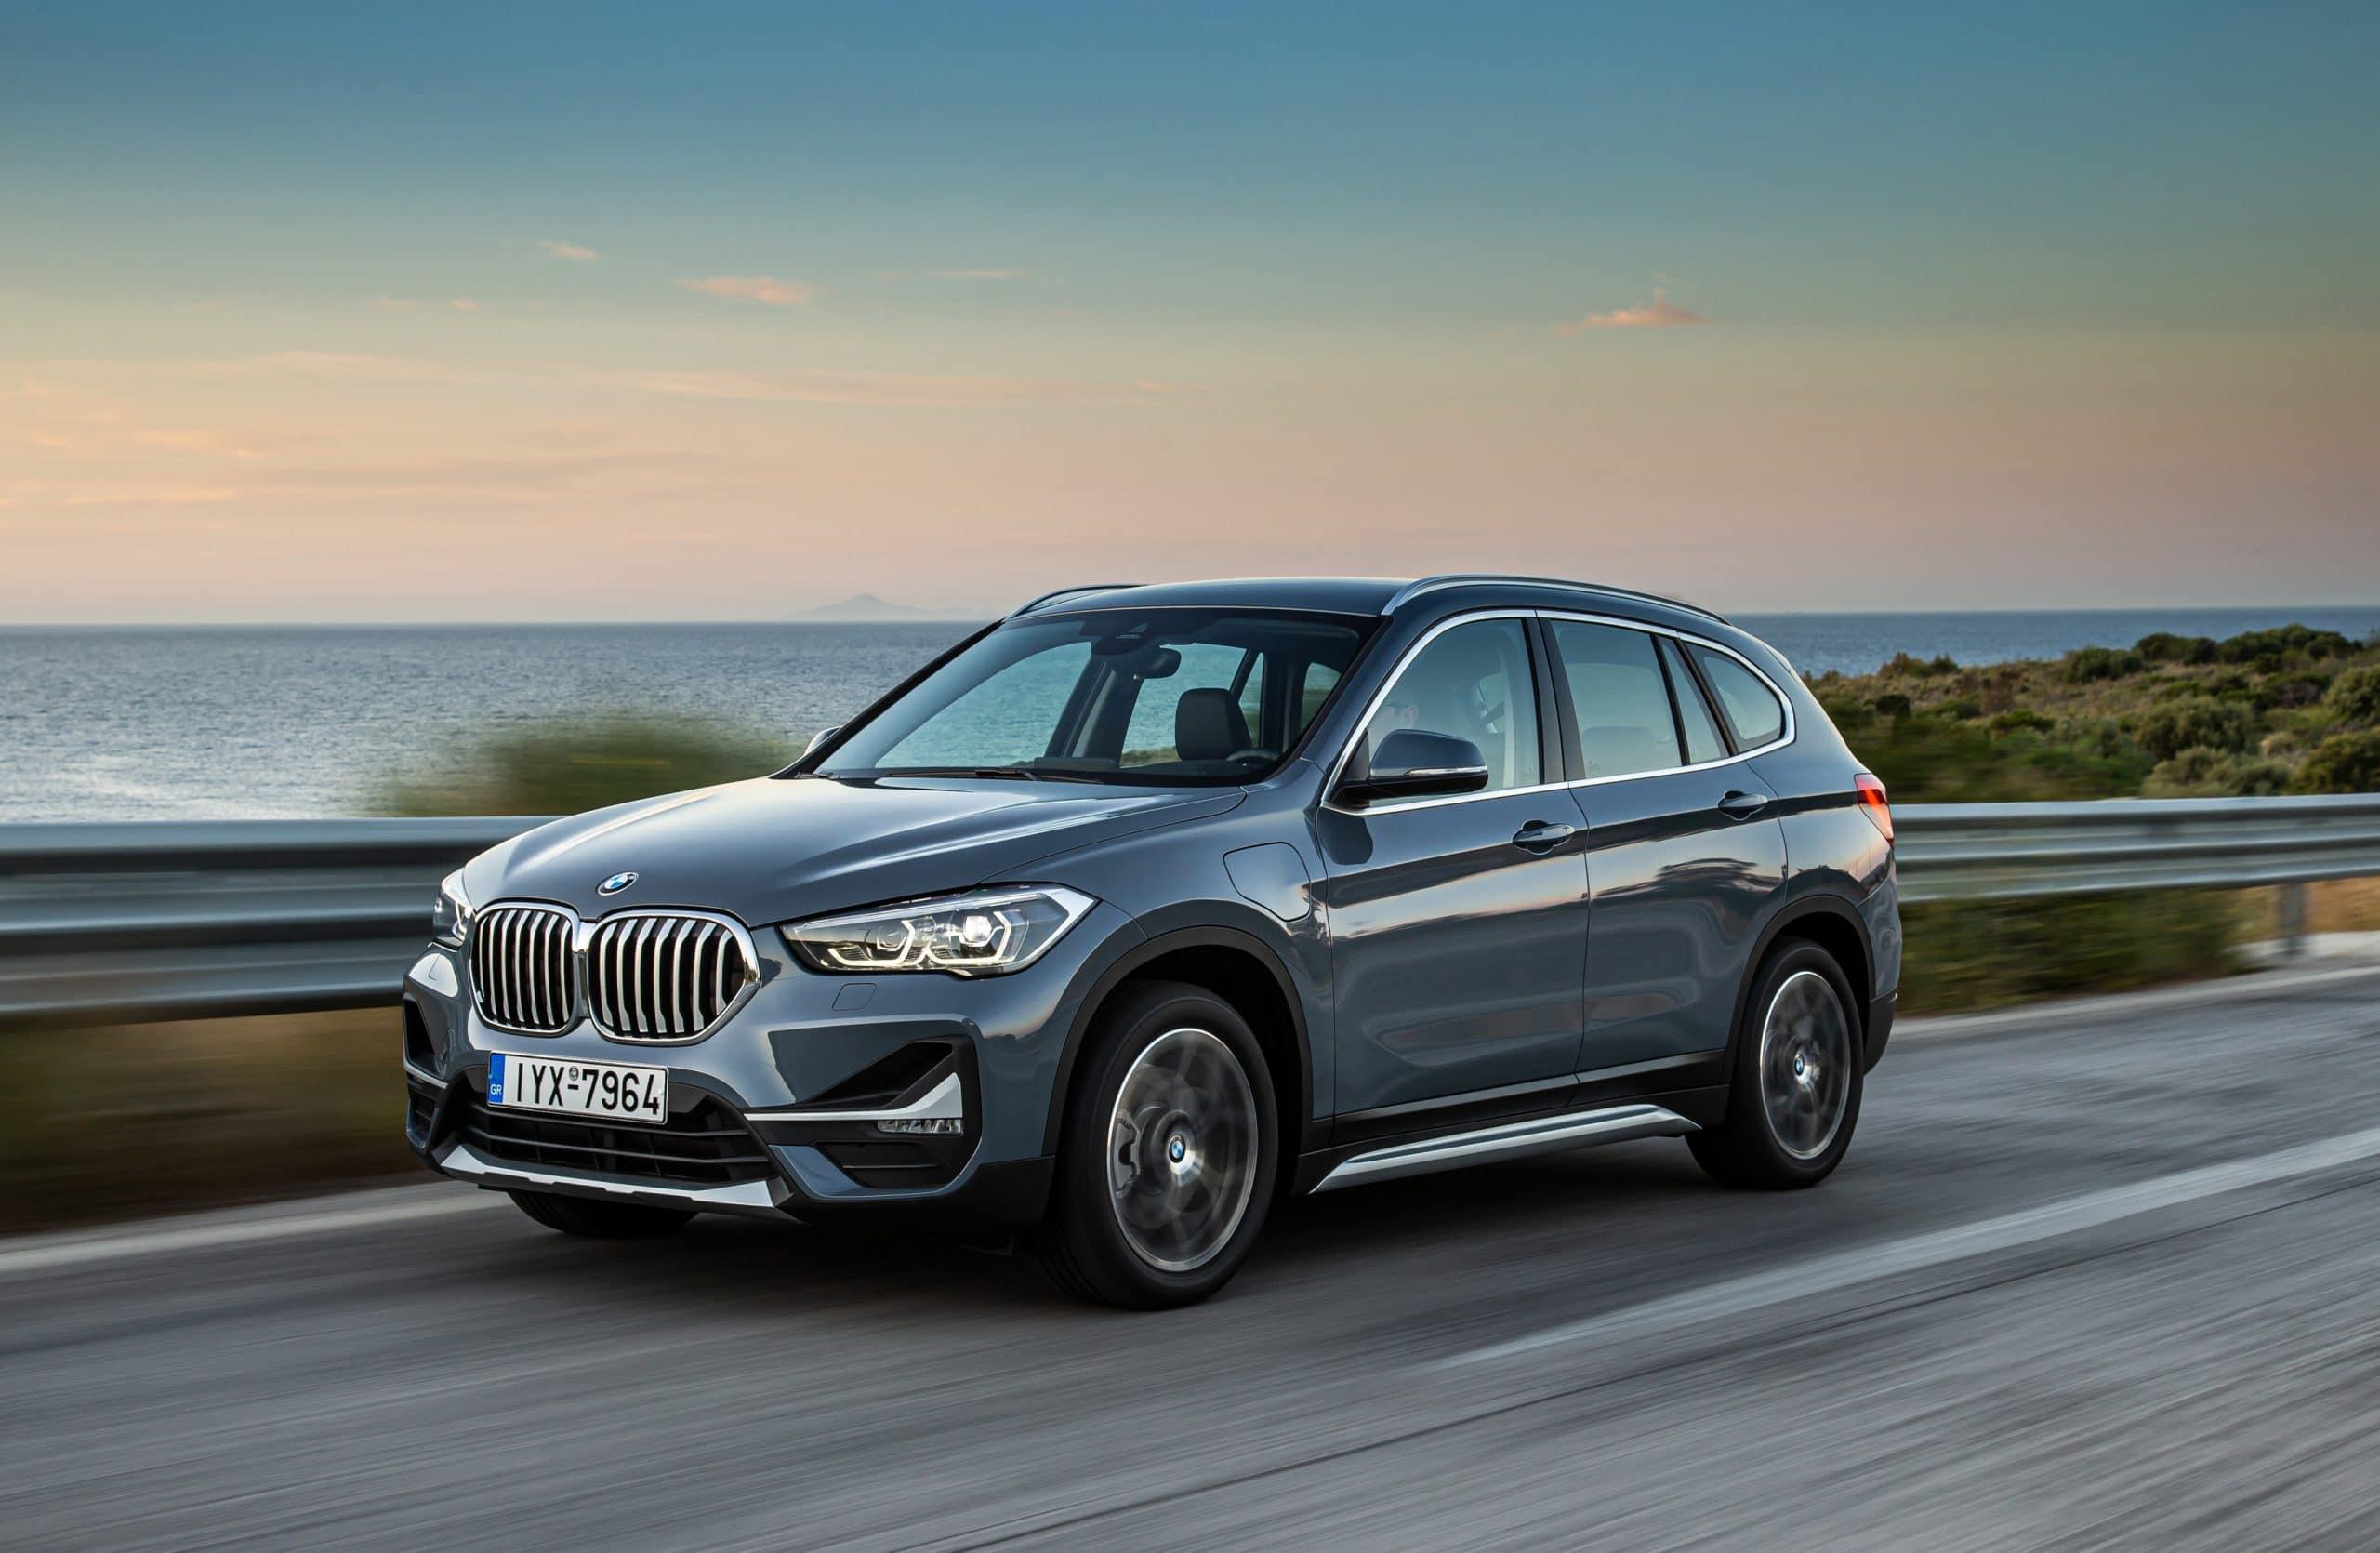 P90389168 highRes scaled BMW X1 : Best seller στην κατηγορία του, για 6η συνεχή χρονιά BMW, BMW X1, X1, ειδήσεις, Νέα, πωλήσεις, πωλήσεις αυτοκινήτων